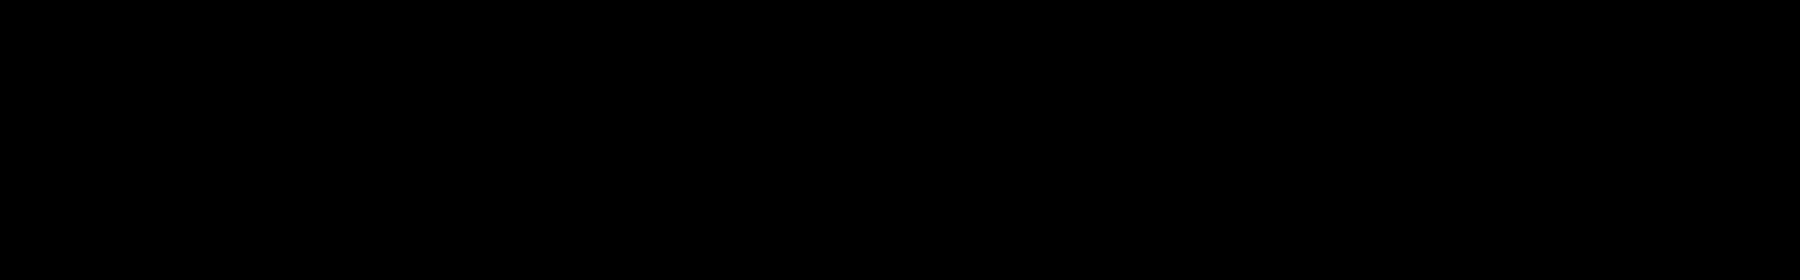 AAA Game Character Dungeon Master audio waveform